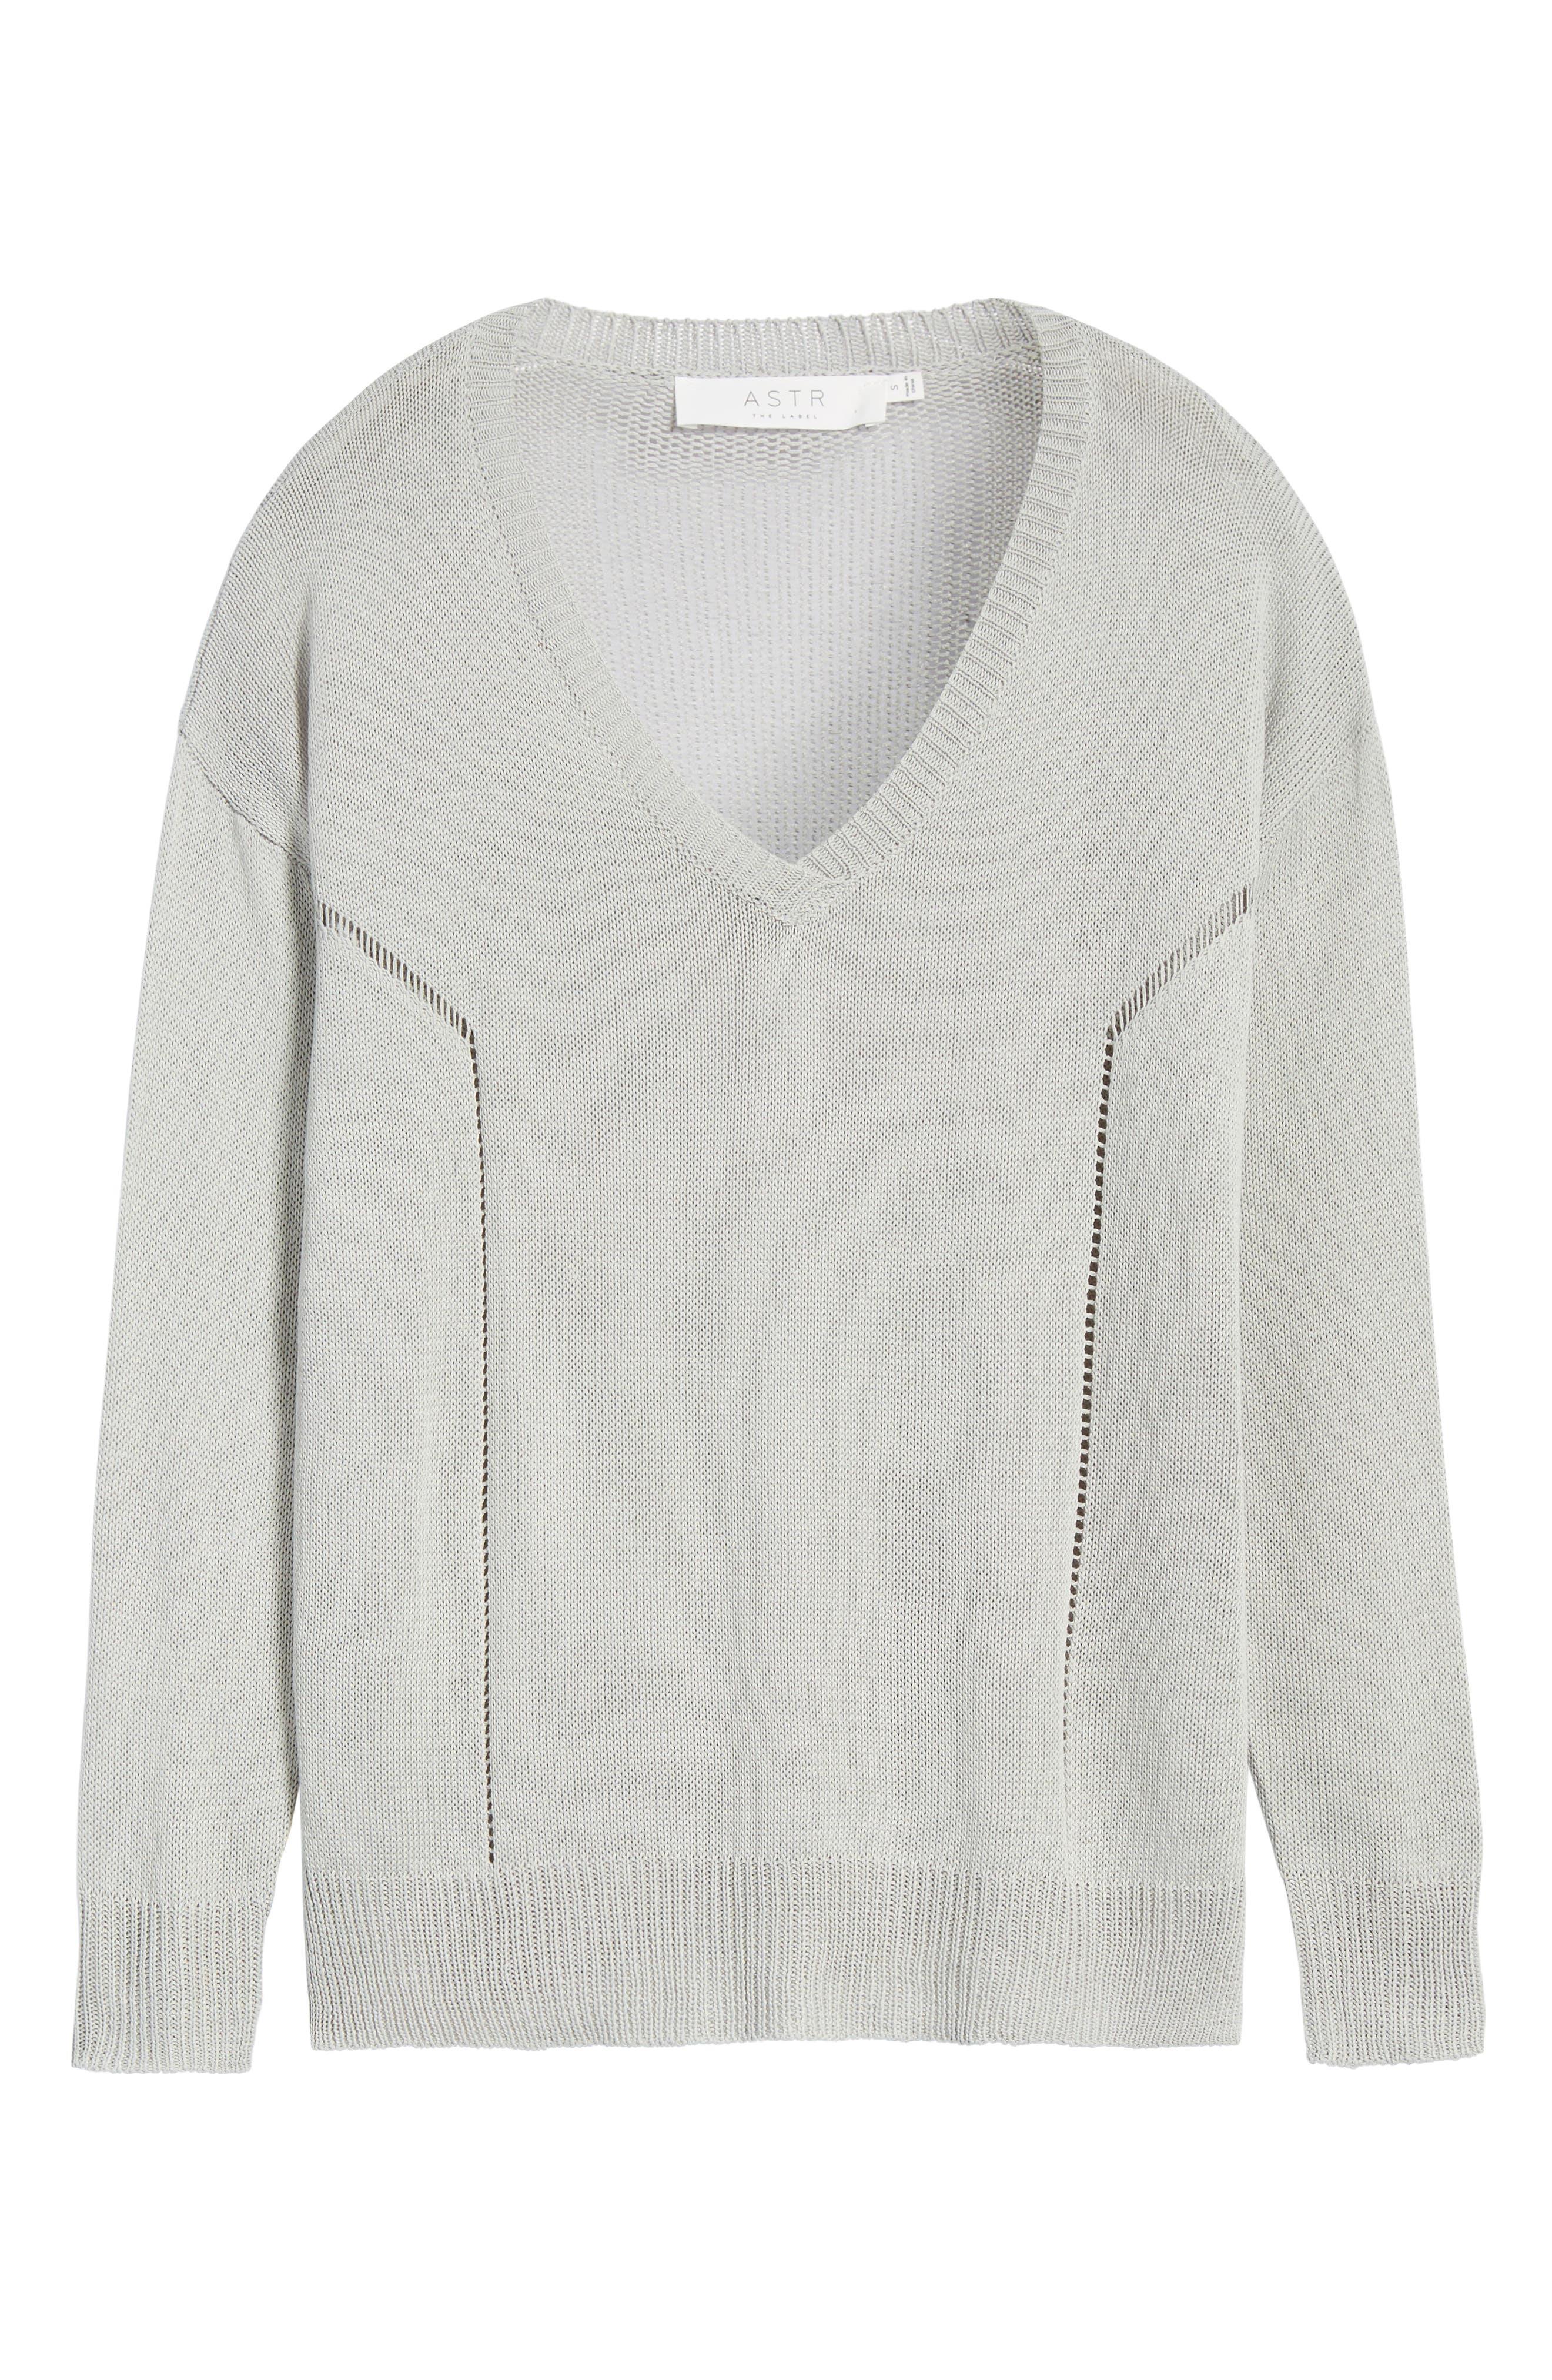 Open Lines V-Neck Sweater,                             Alternate thumbnail 6, color,                             020